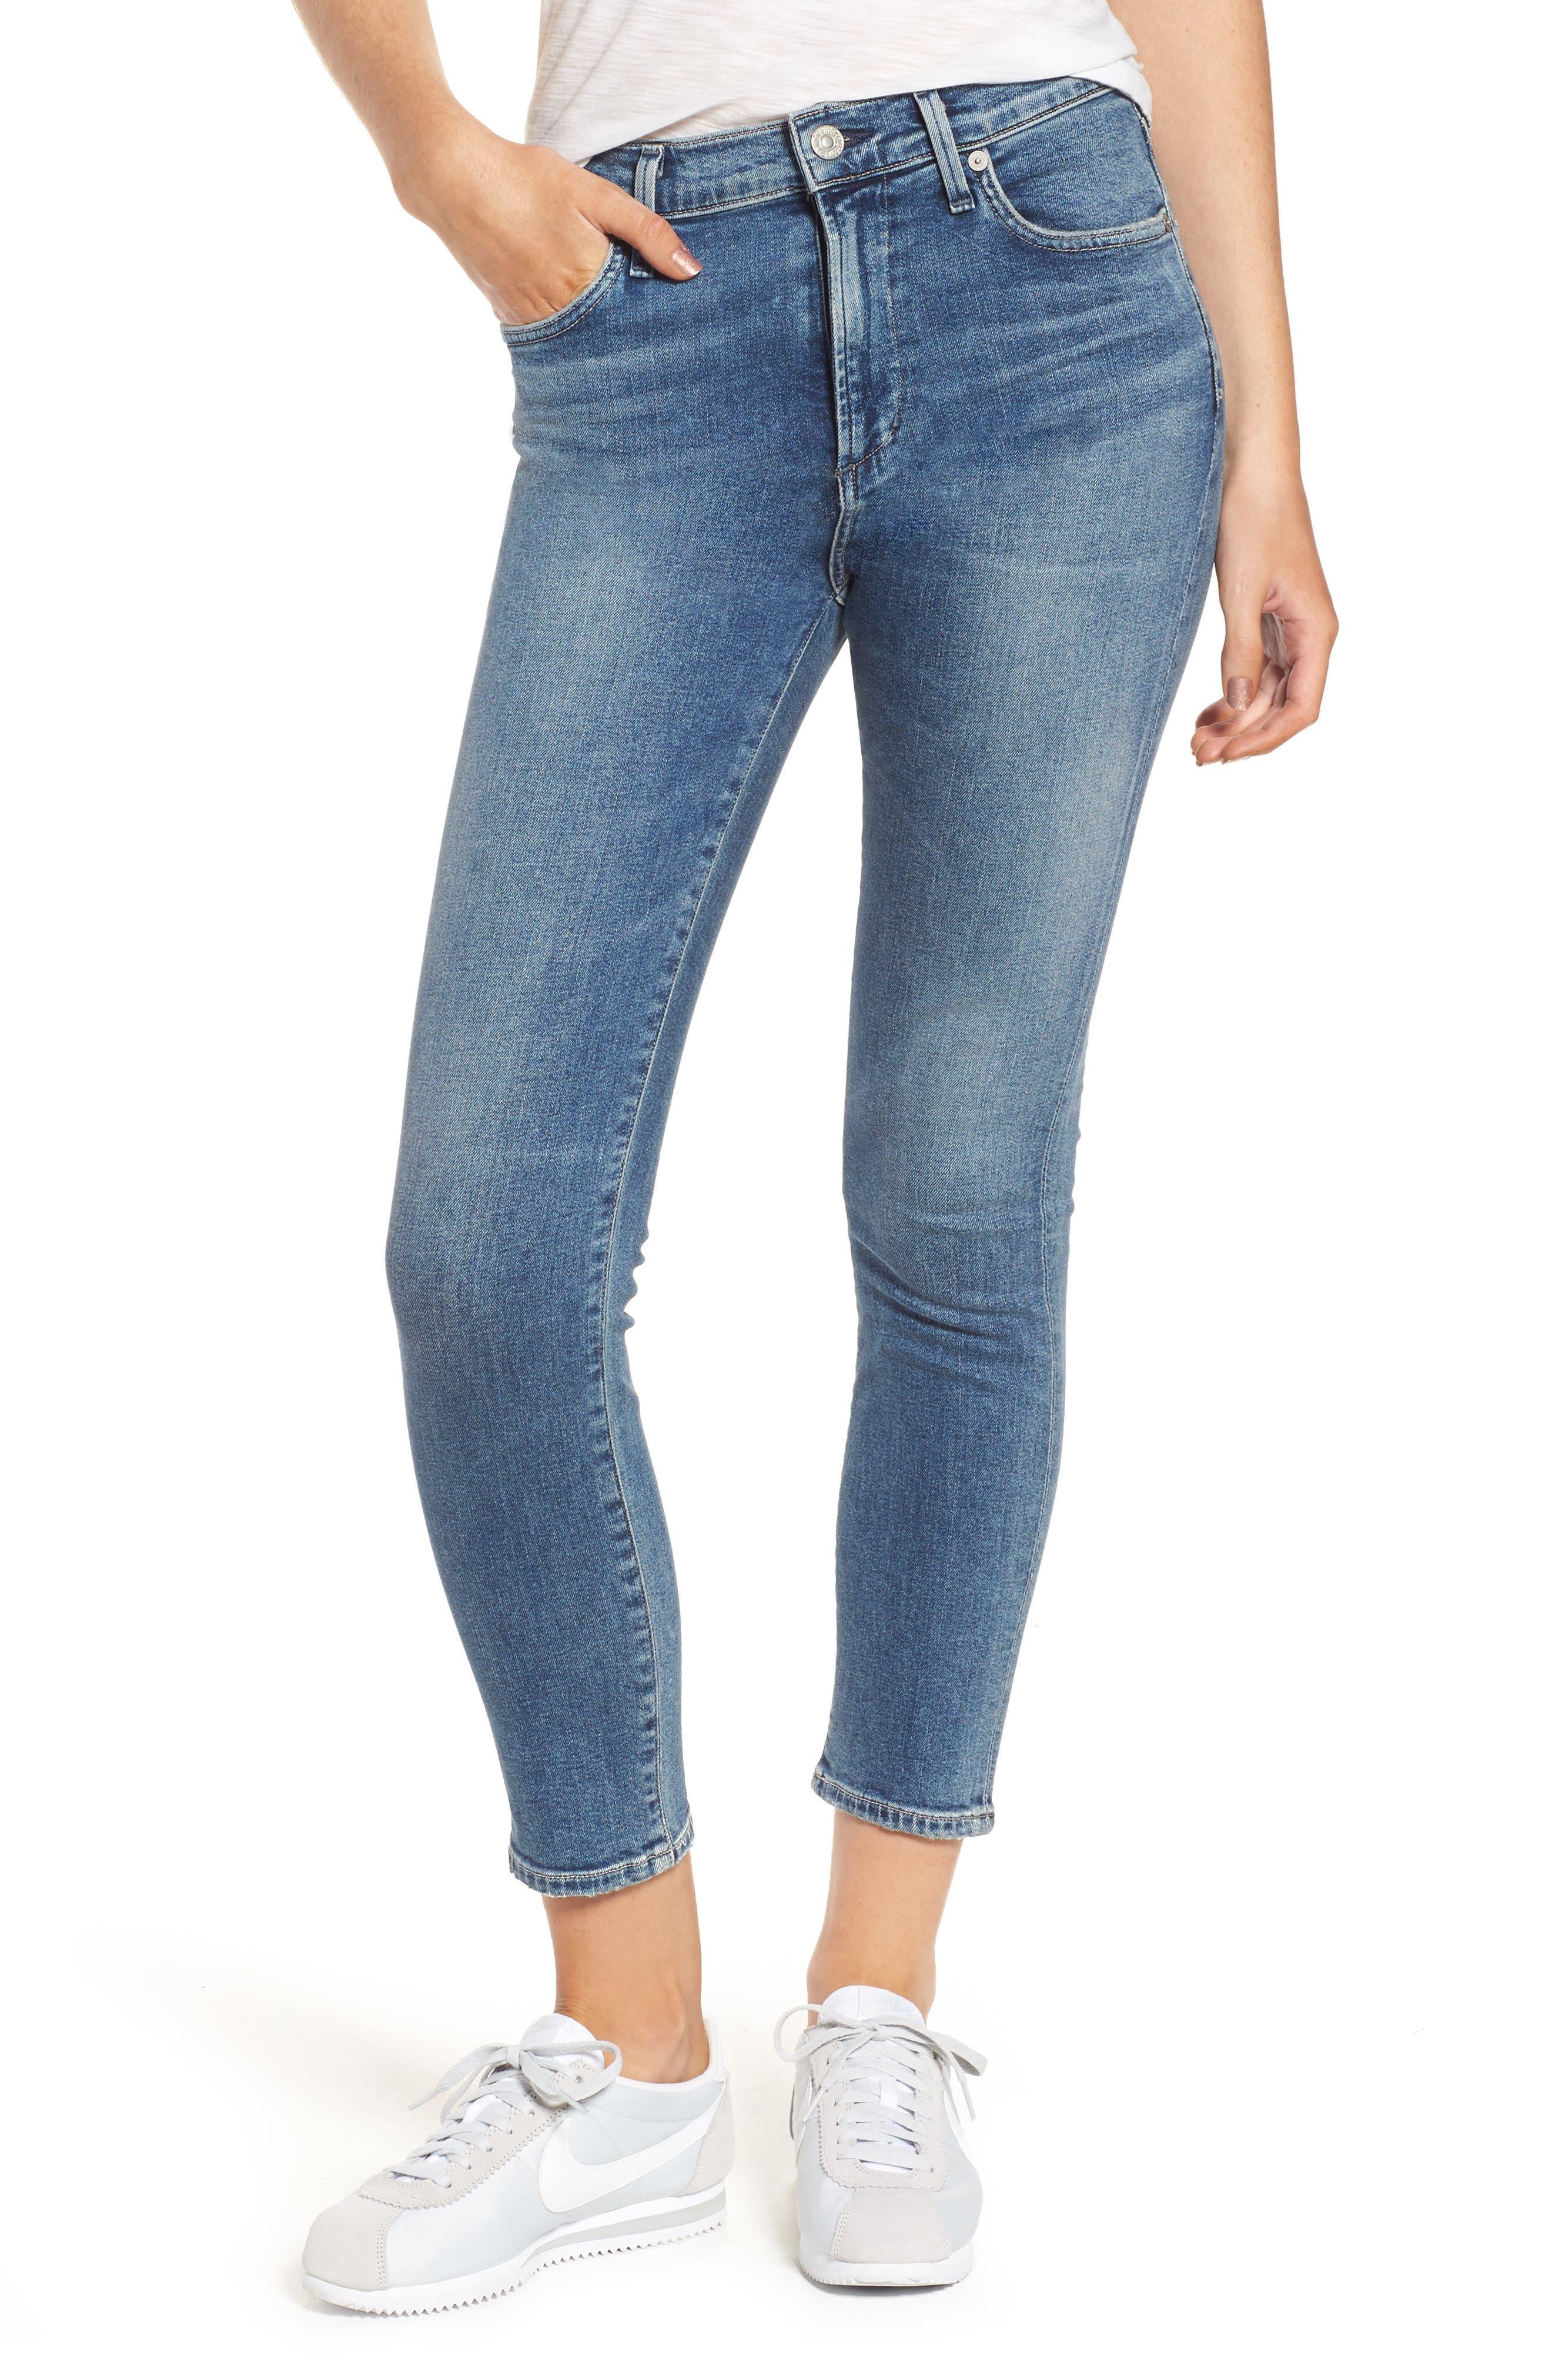 Rocket Crop Skinny Jeans,                         Main,                         color, Orbit